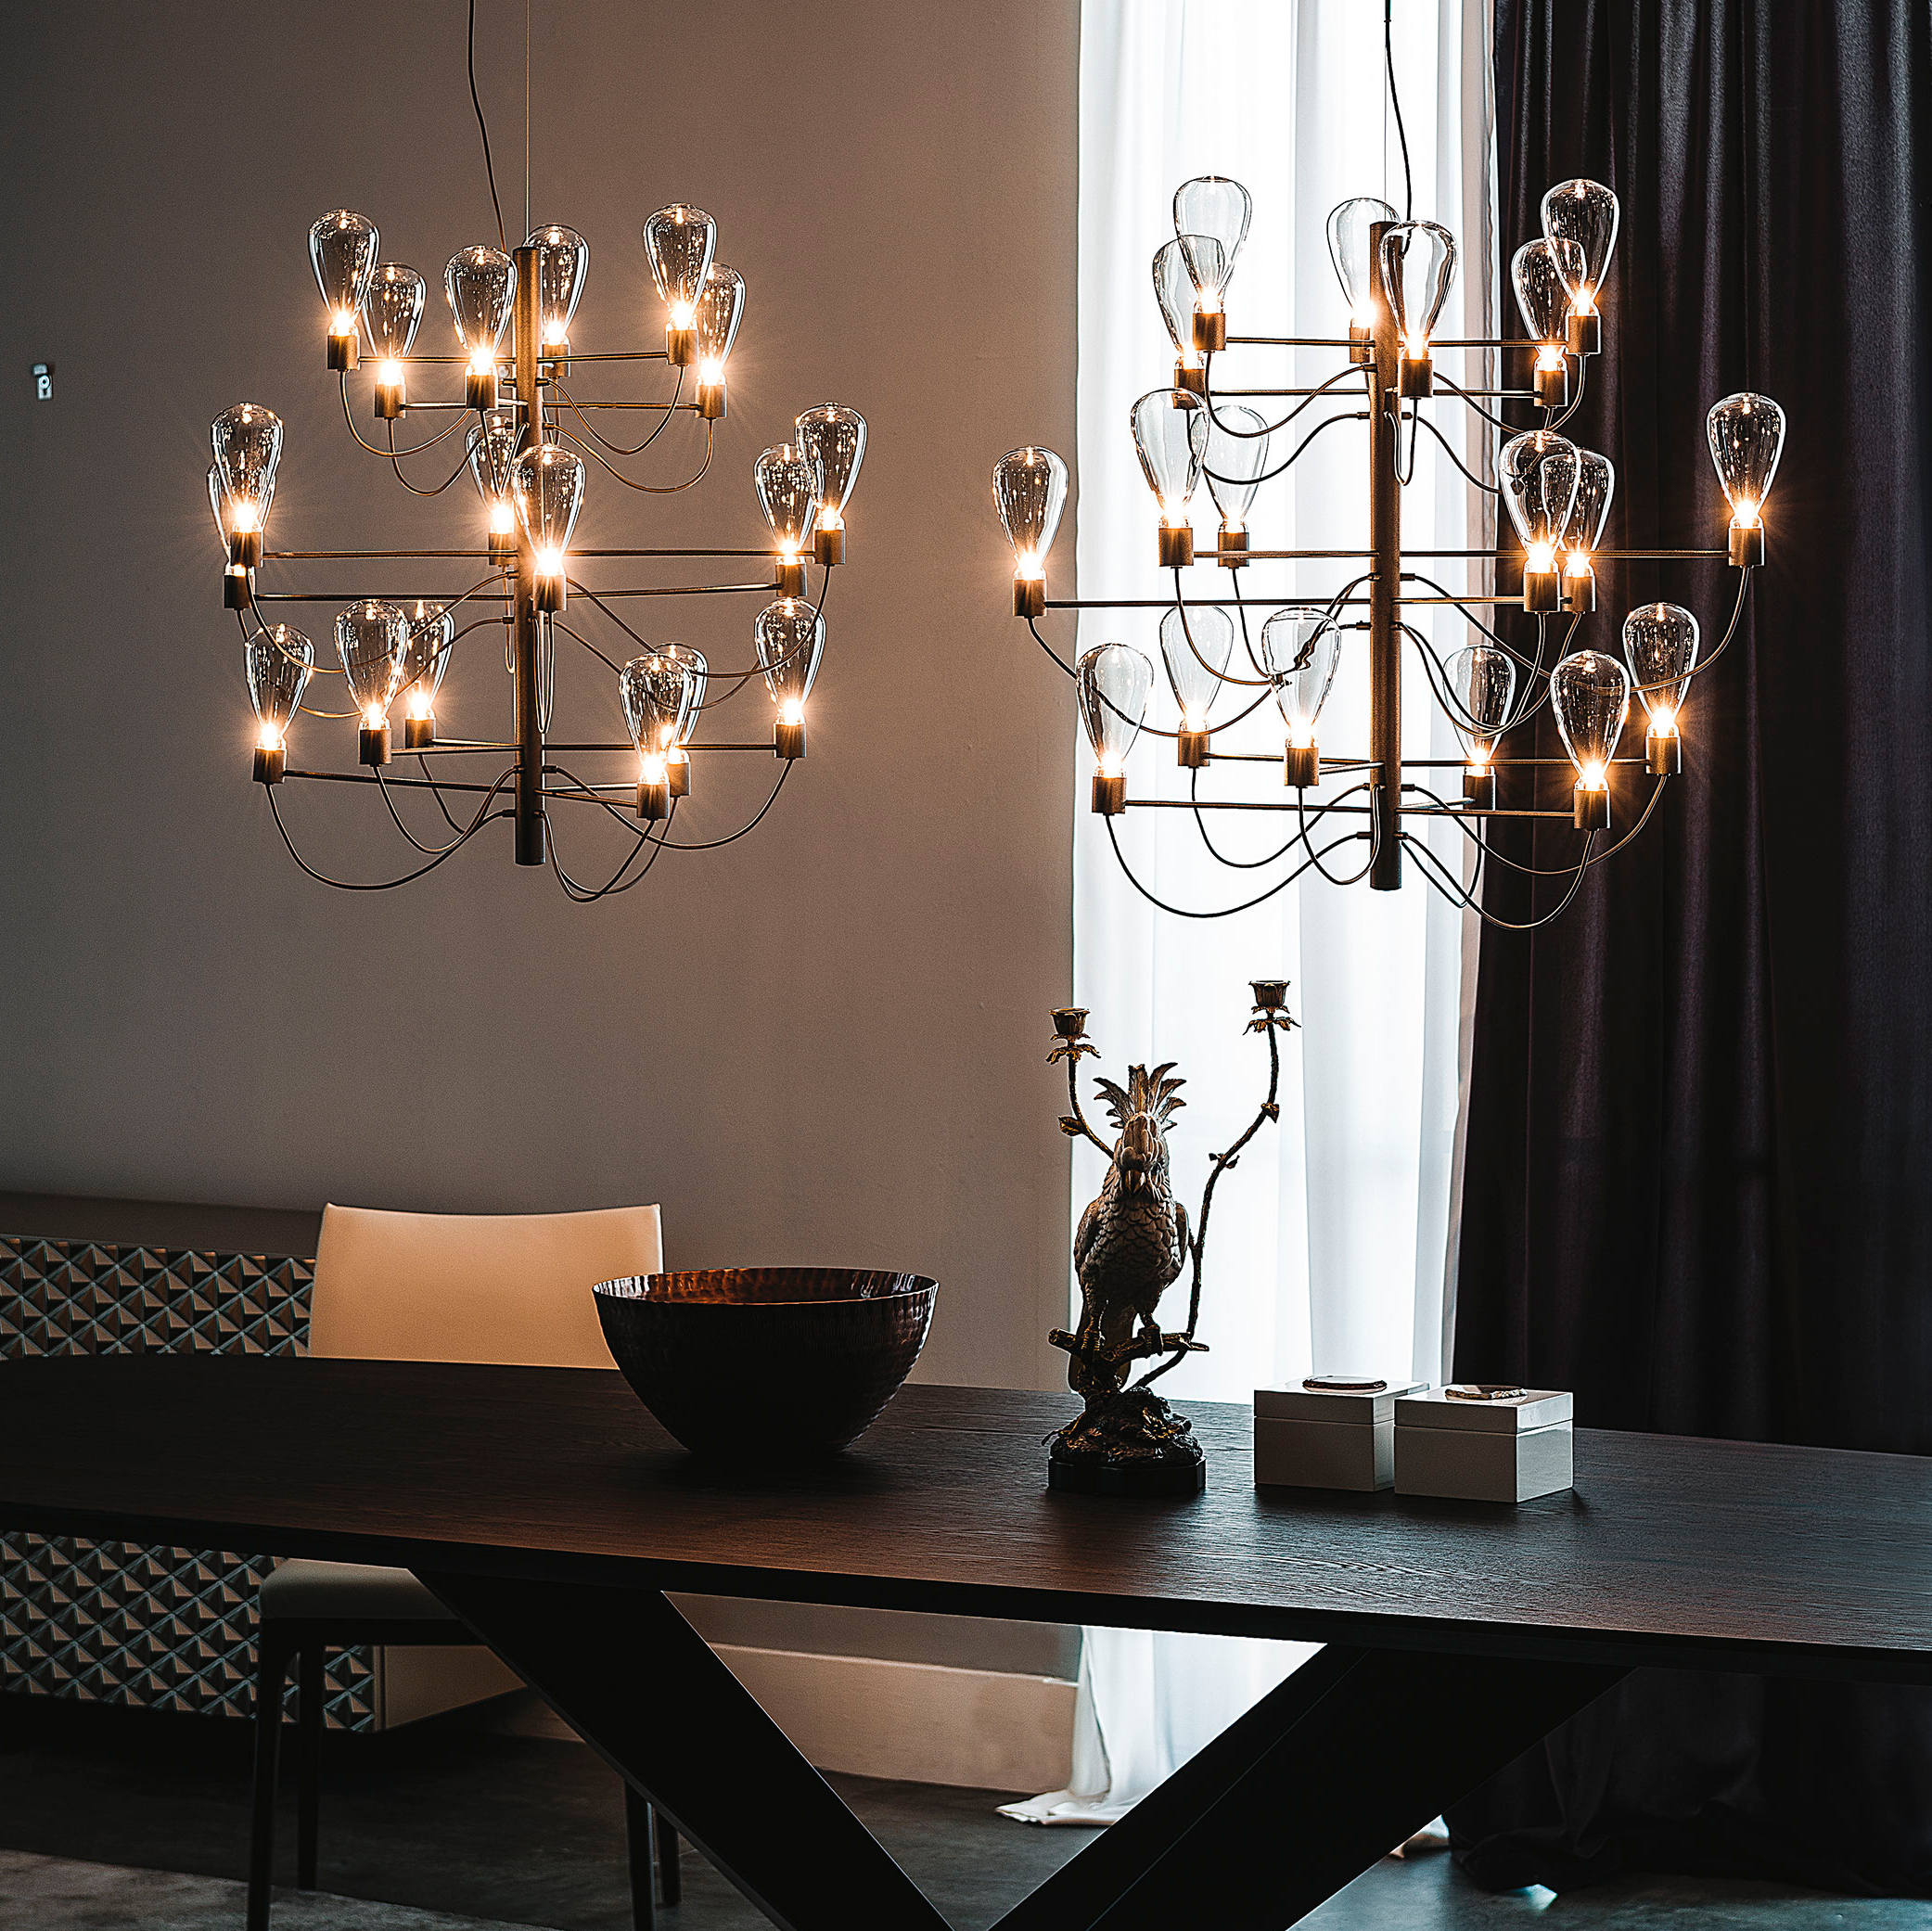 Contemporary Italian Designer Poseidon Chandelier Luxury Furniture At Coni